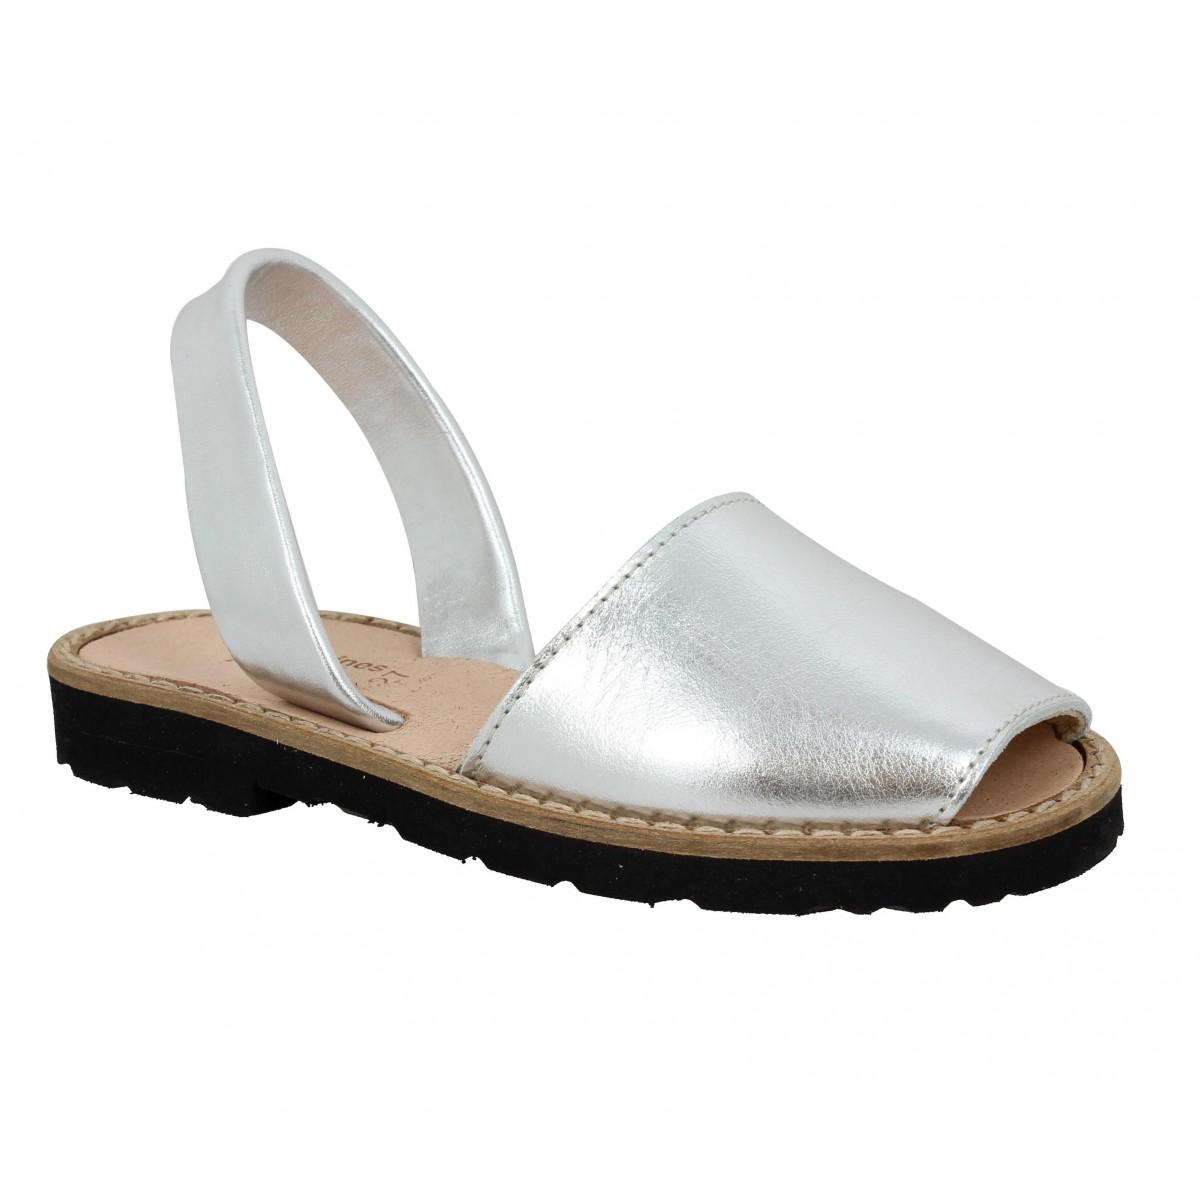 Sandales MINORQUINES Avarca cuir Enfant Argent